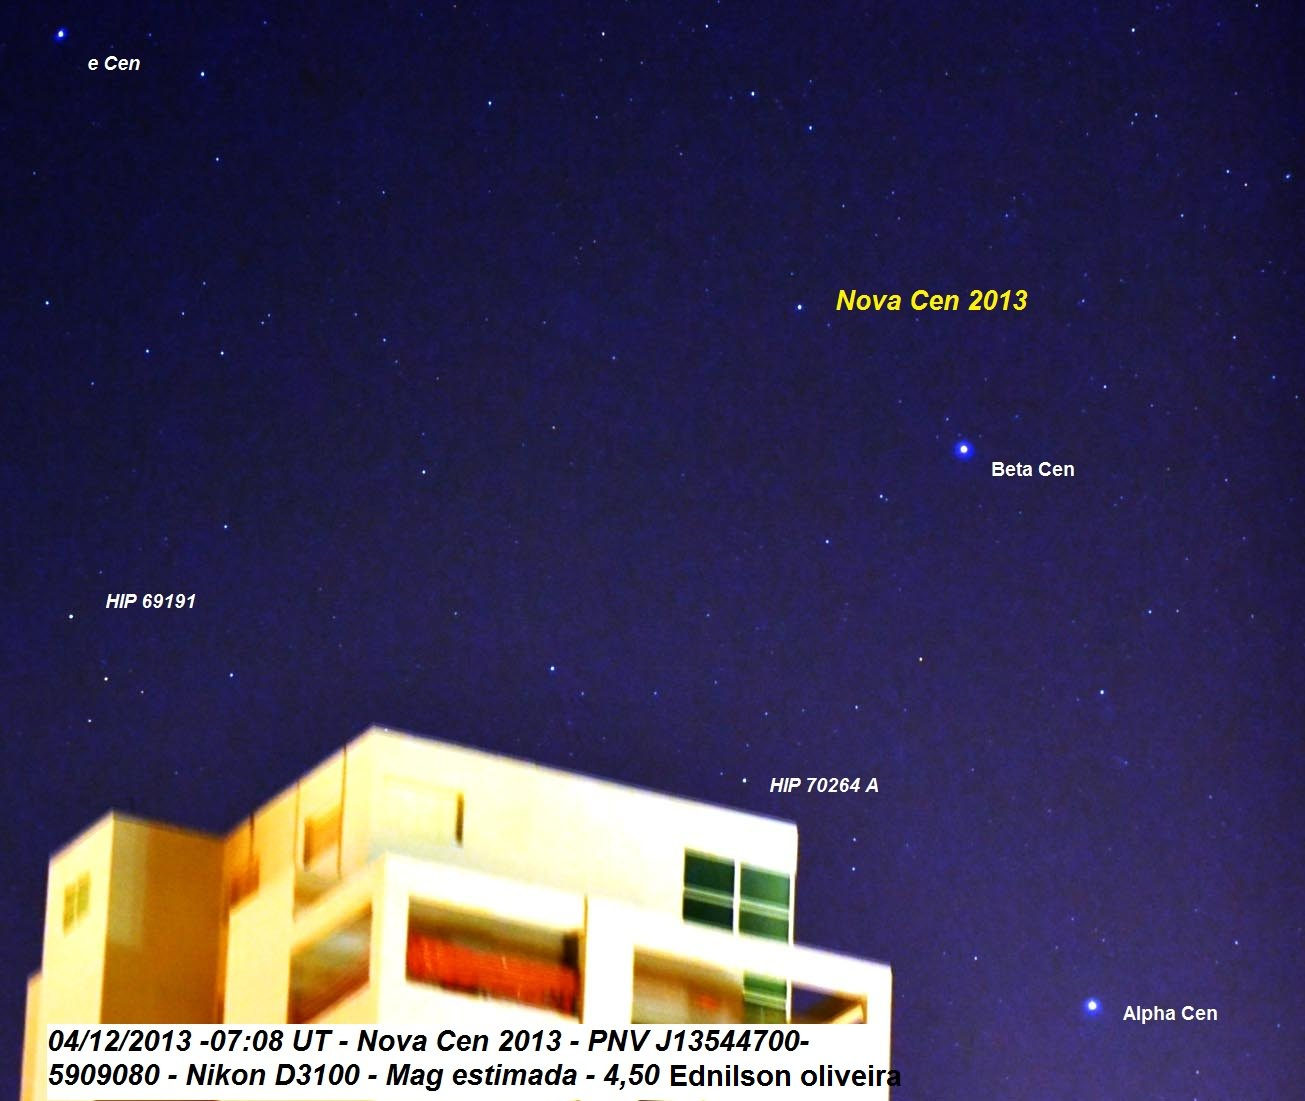 Nova Centauri 2013 | Gilberto Klar Renner - Sky & Telescope